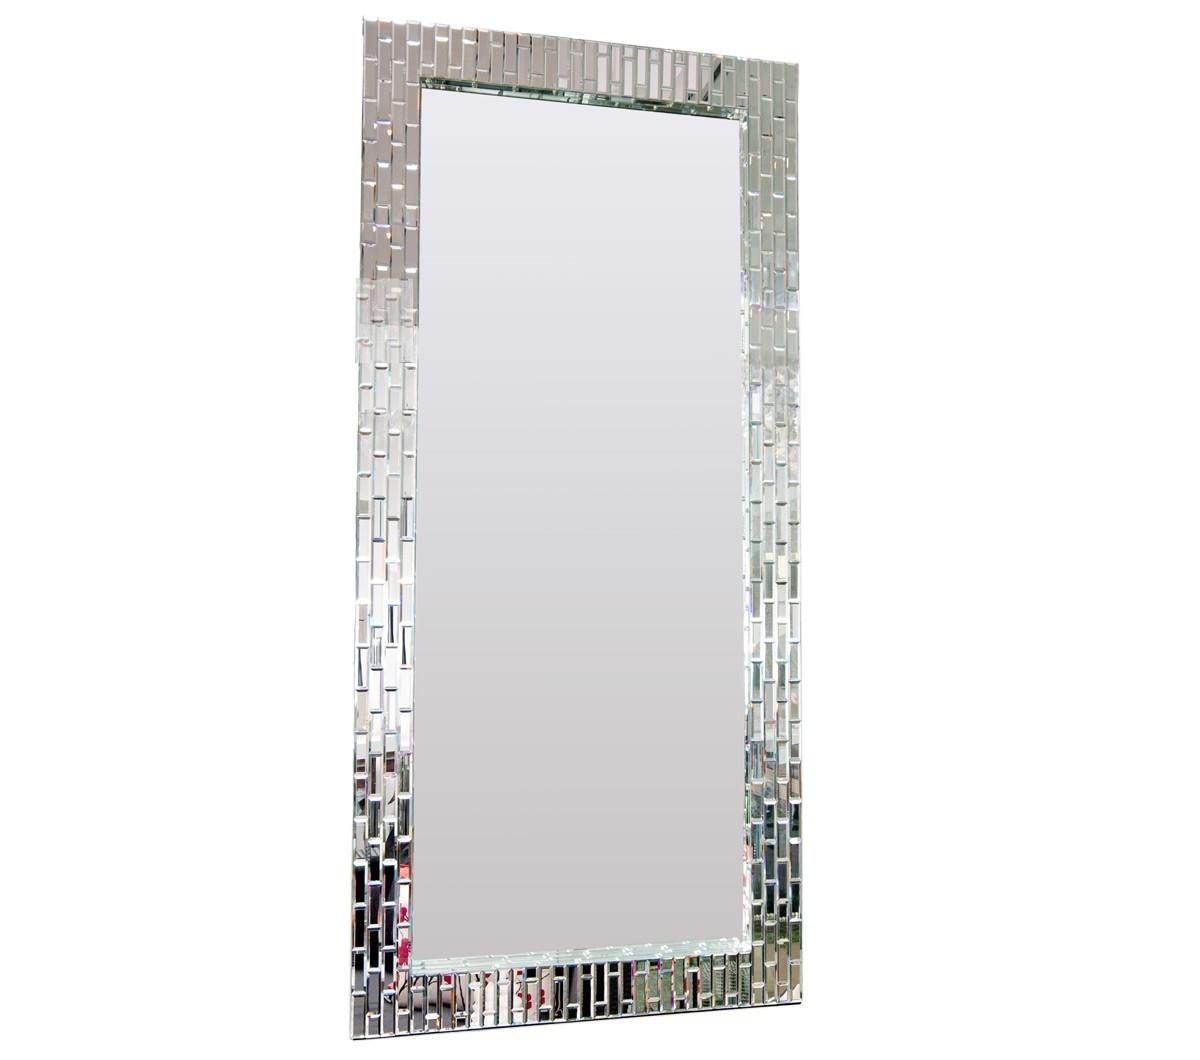 Glitz Mirror Intended For Glitzy Mirrors (Image 7 of 15)